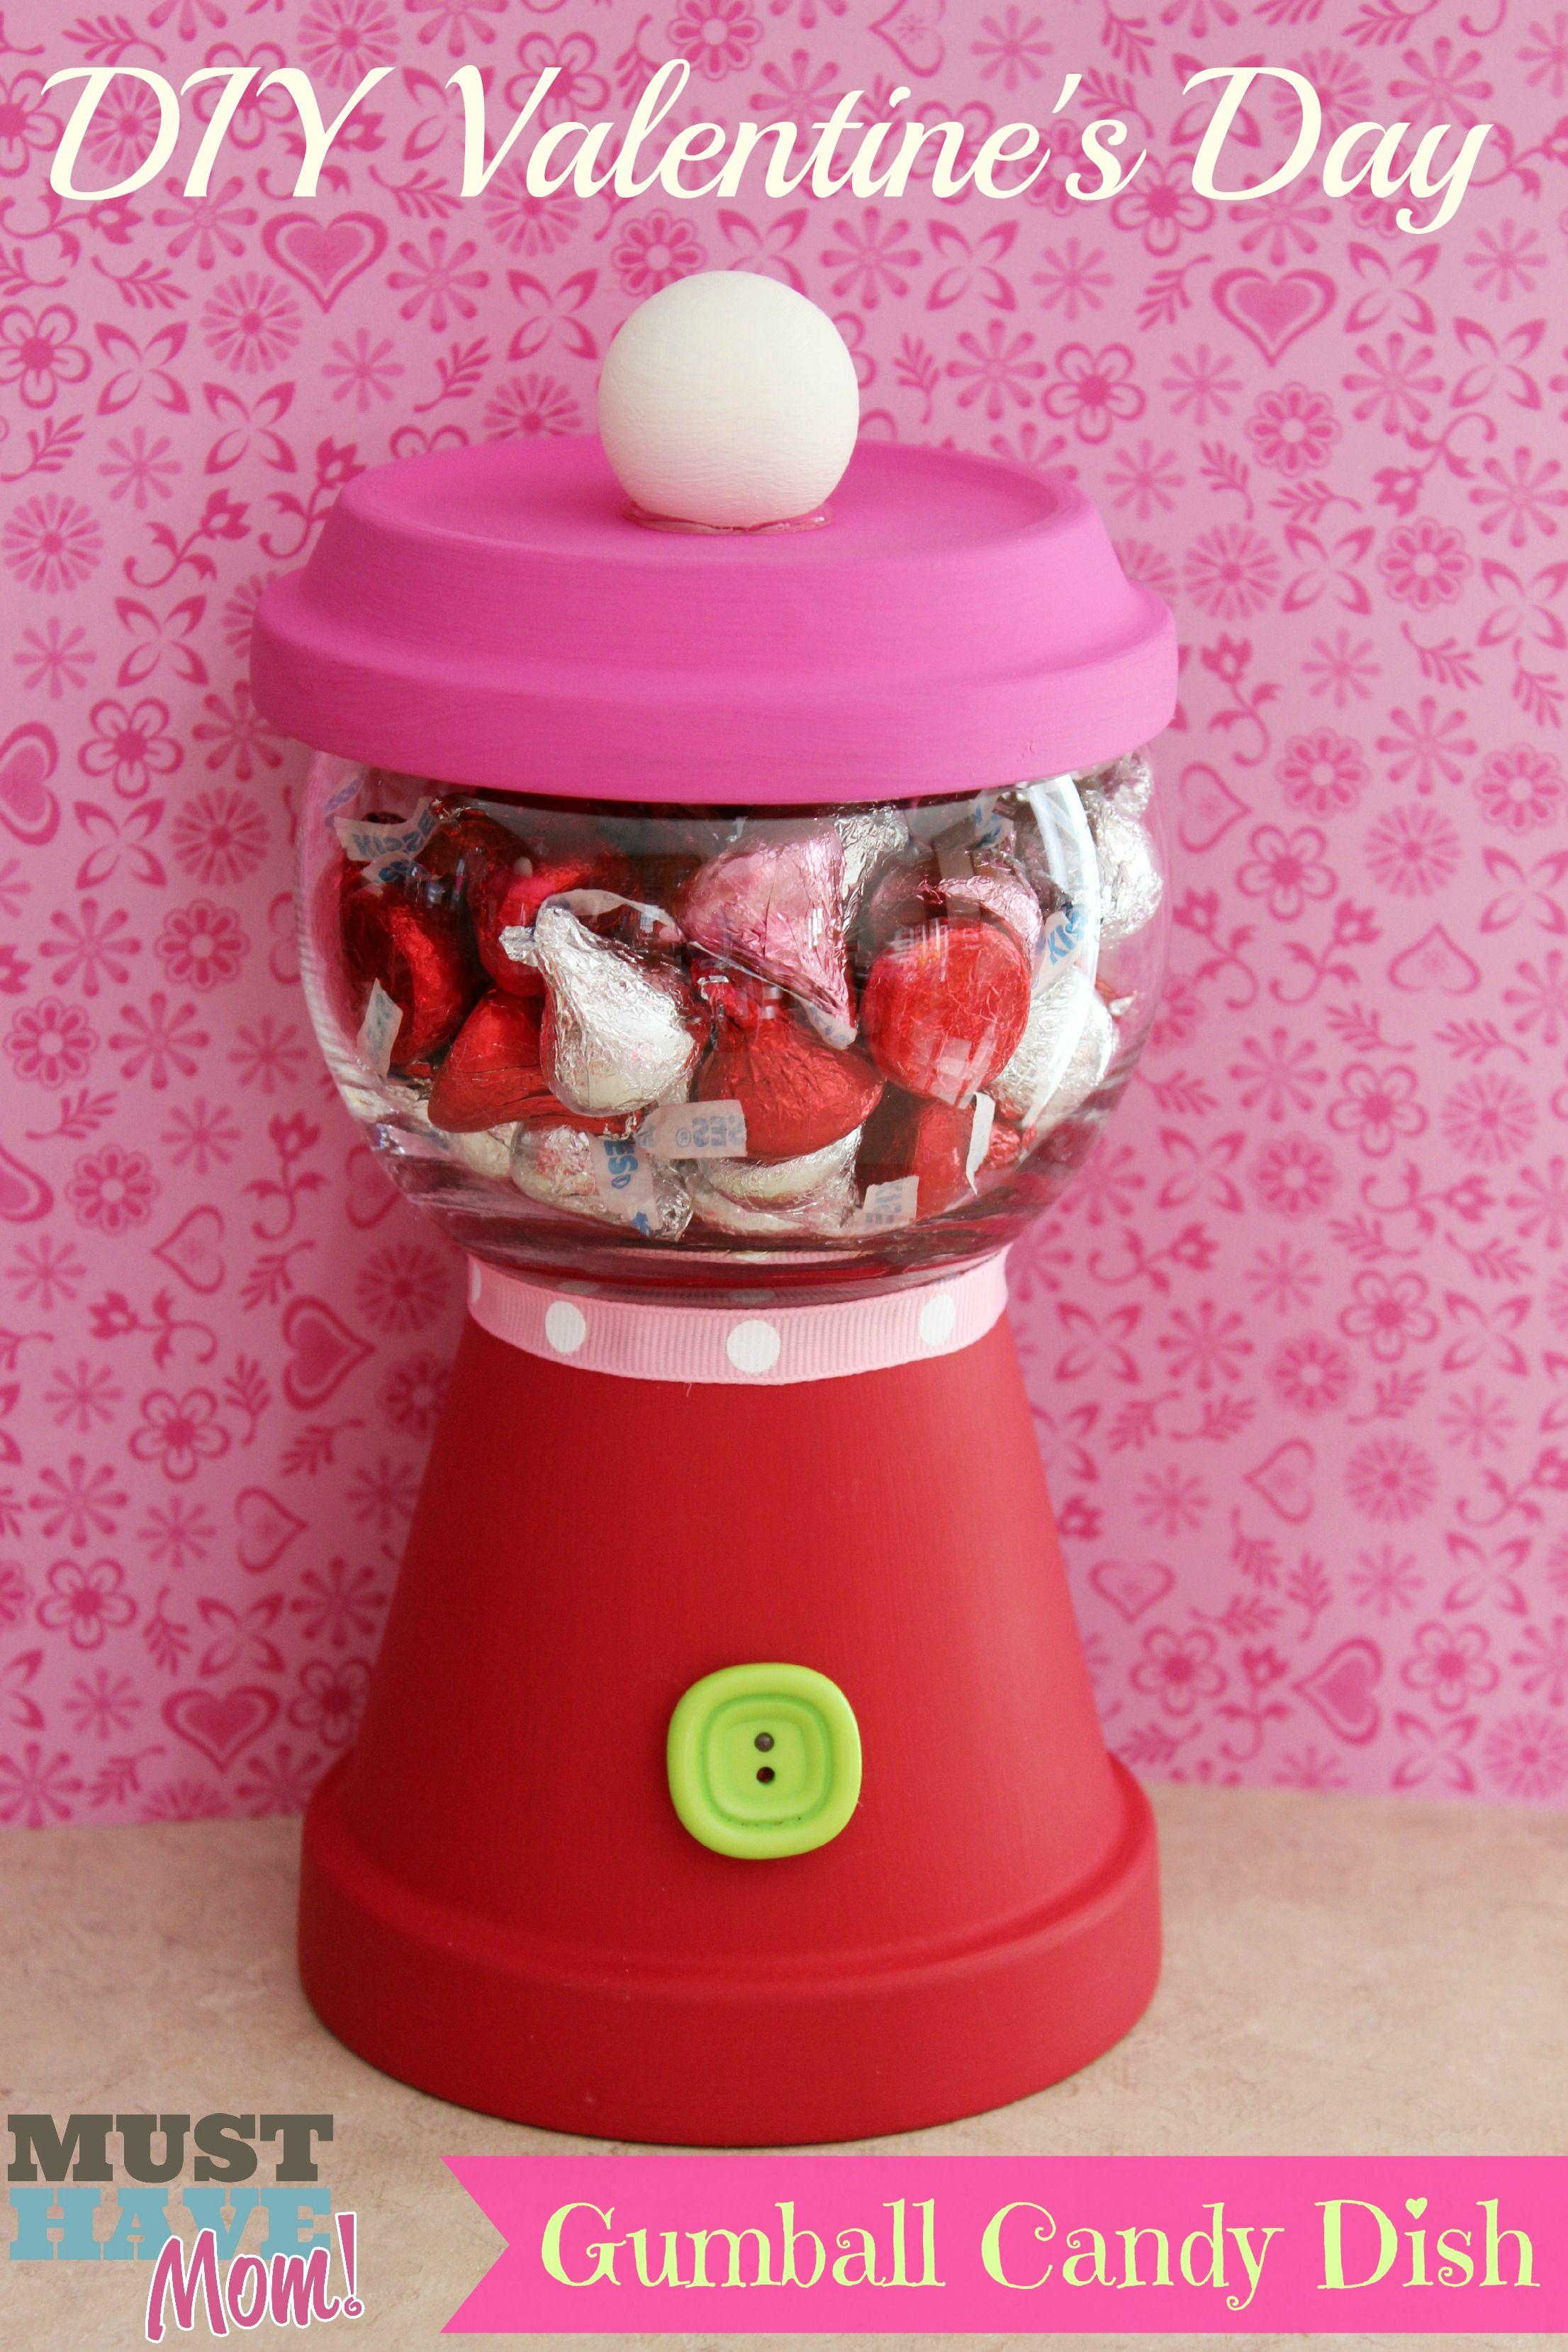 diy valentines day gumball candy dish teacher gift for under 5 - Valentines Day Ideas For Teachers